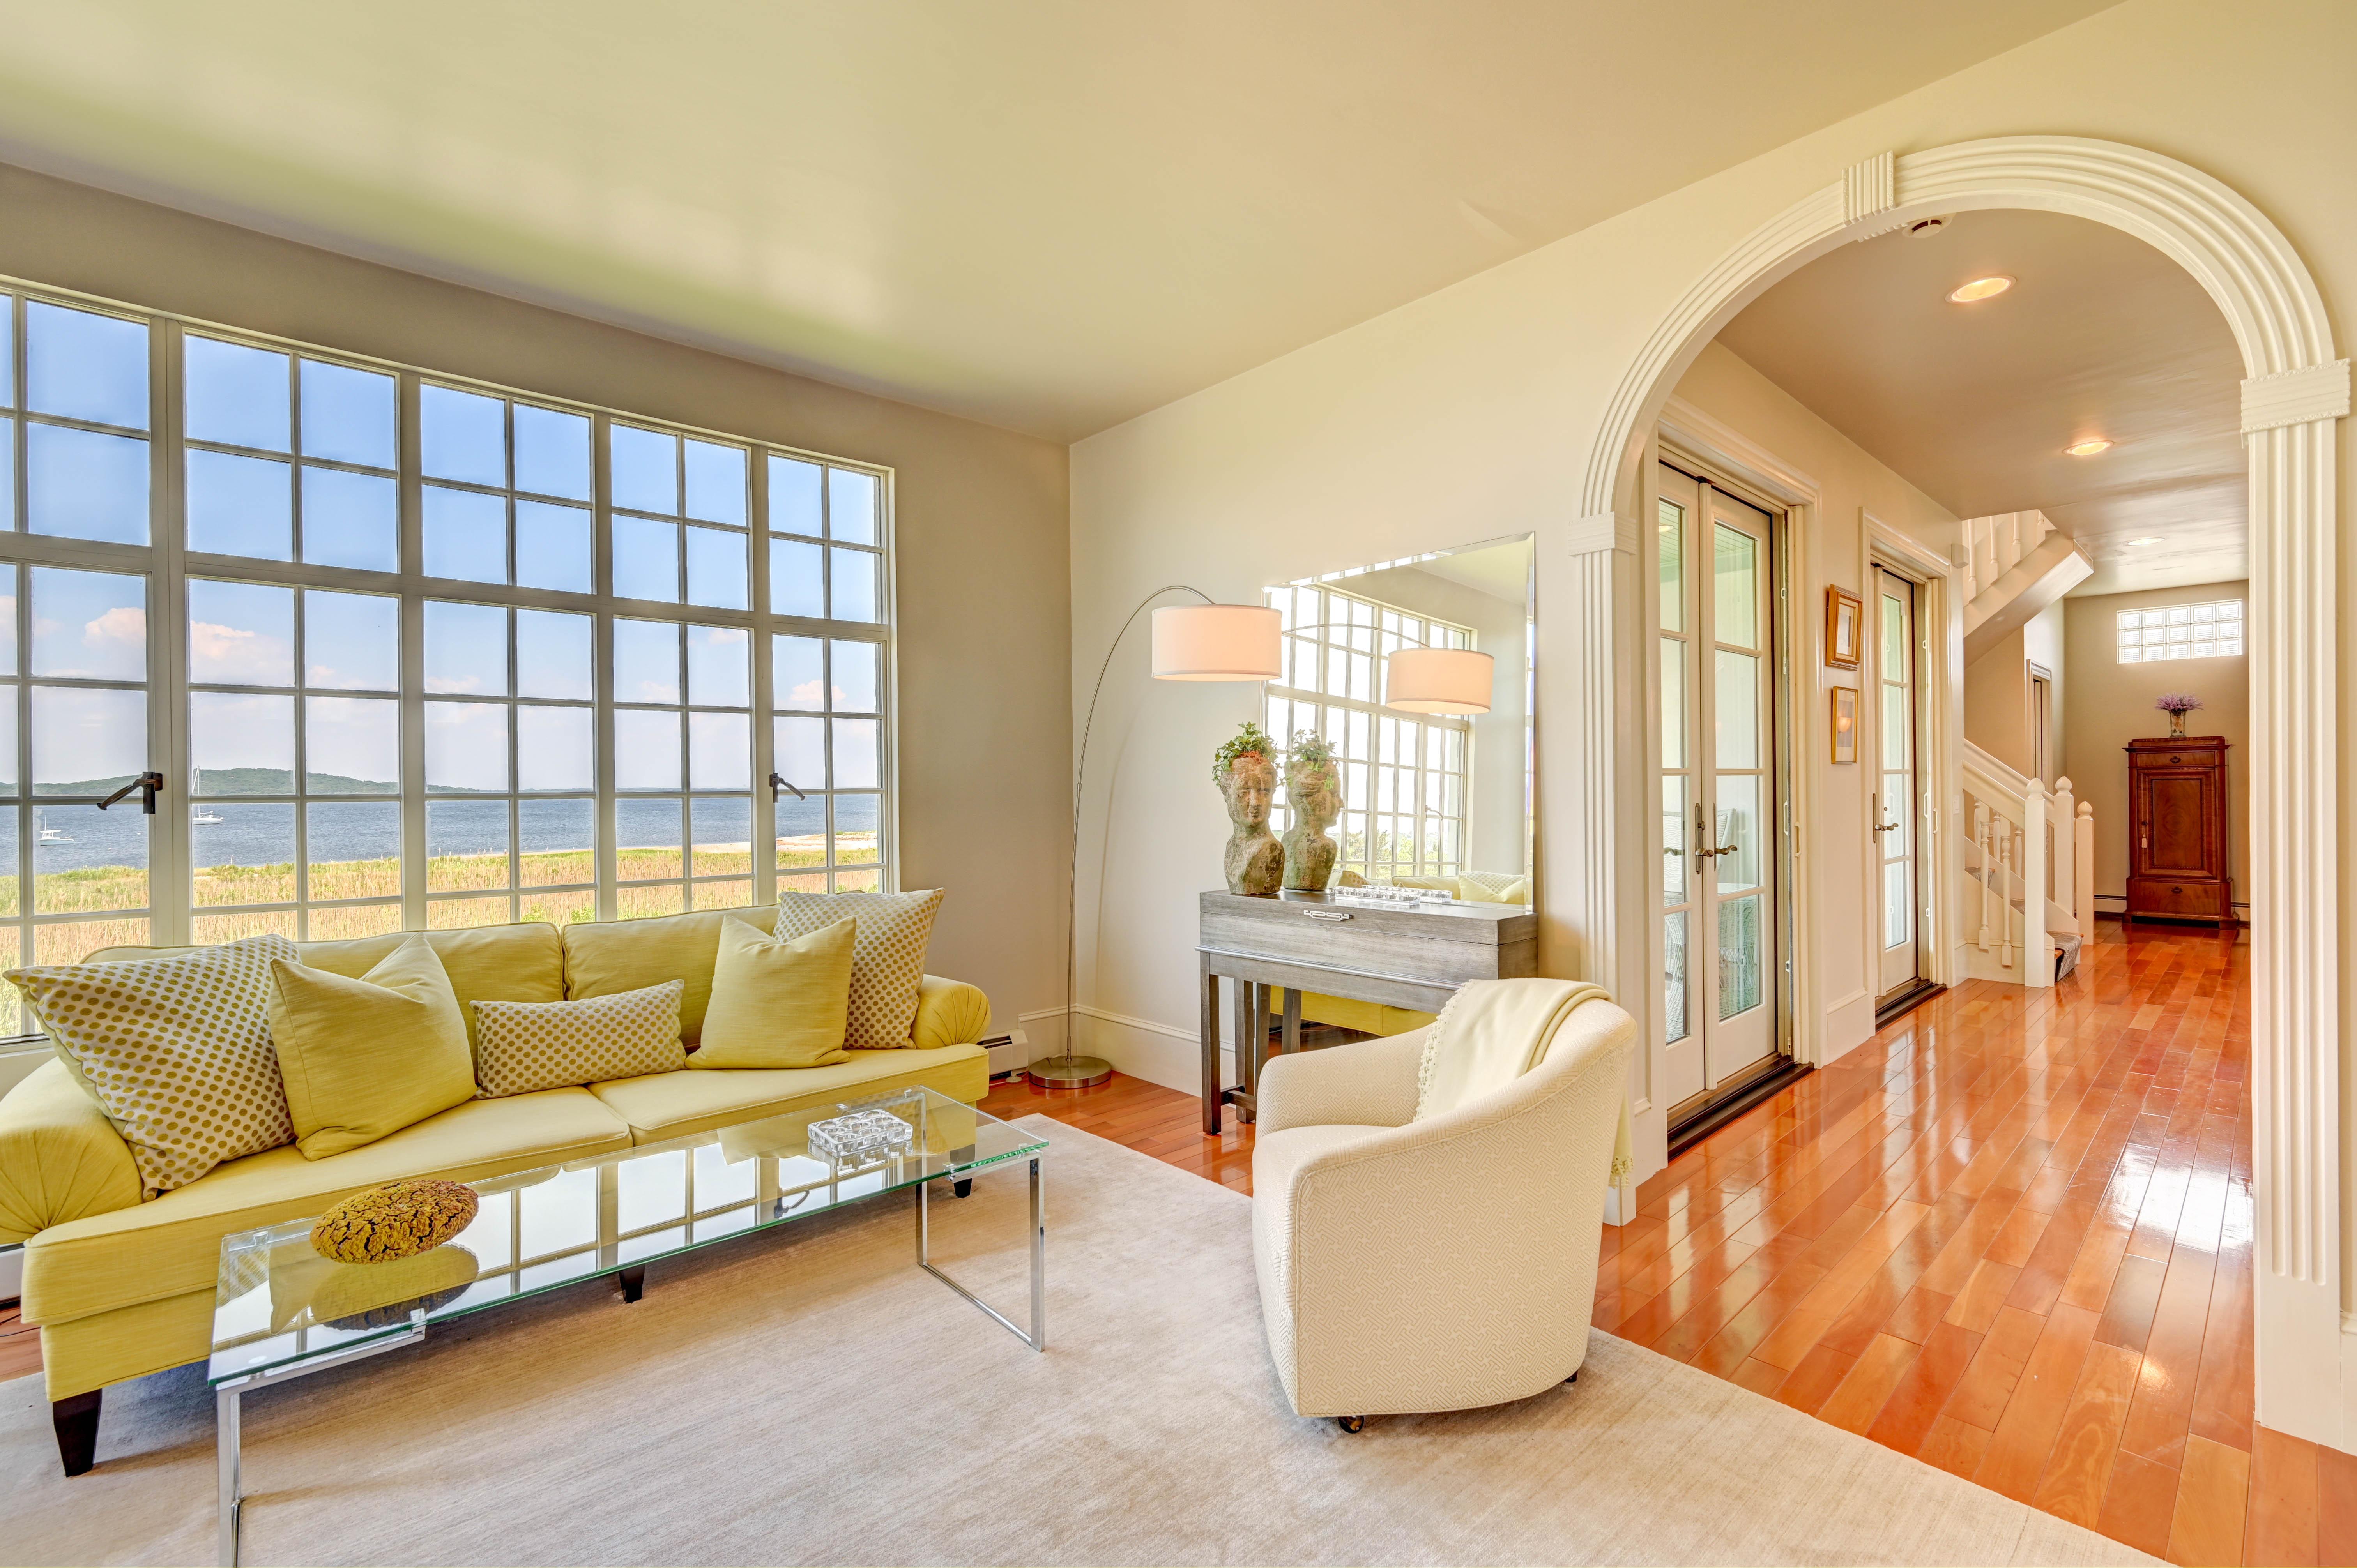 130-common-fence-portsmouth-ri-living-window